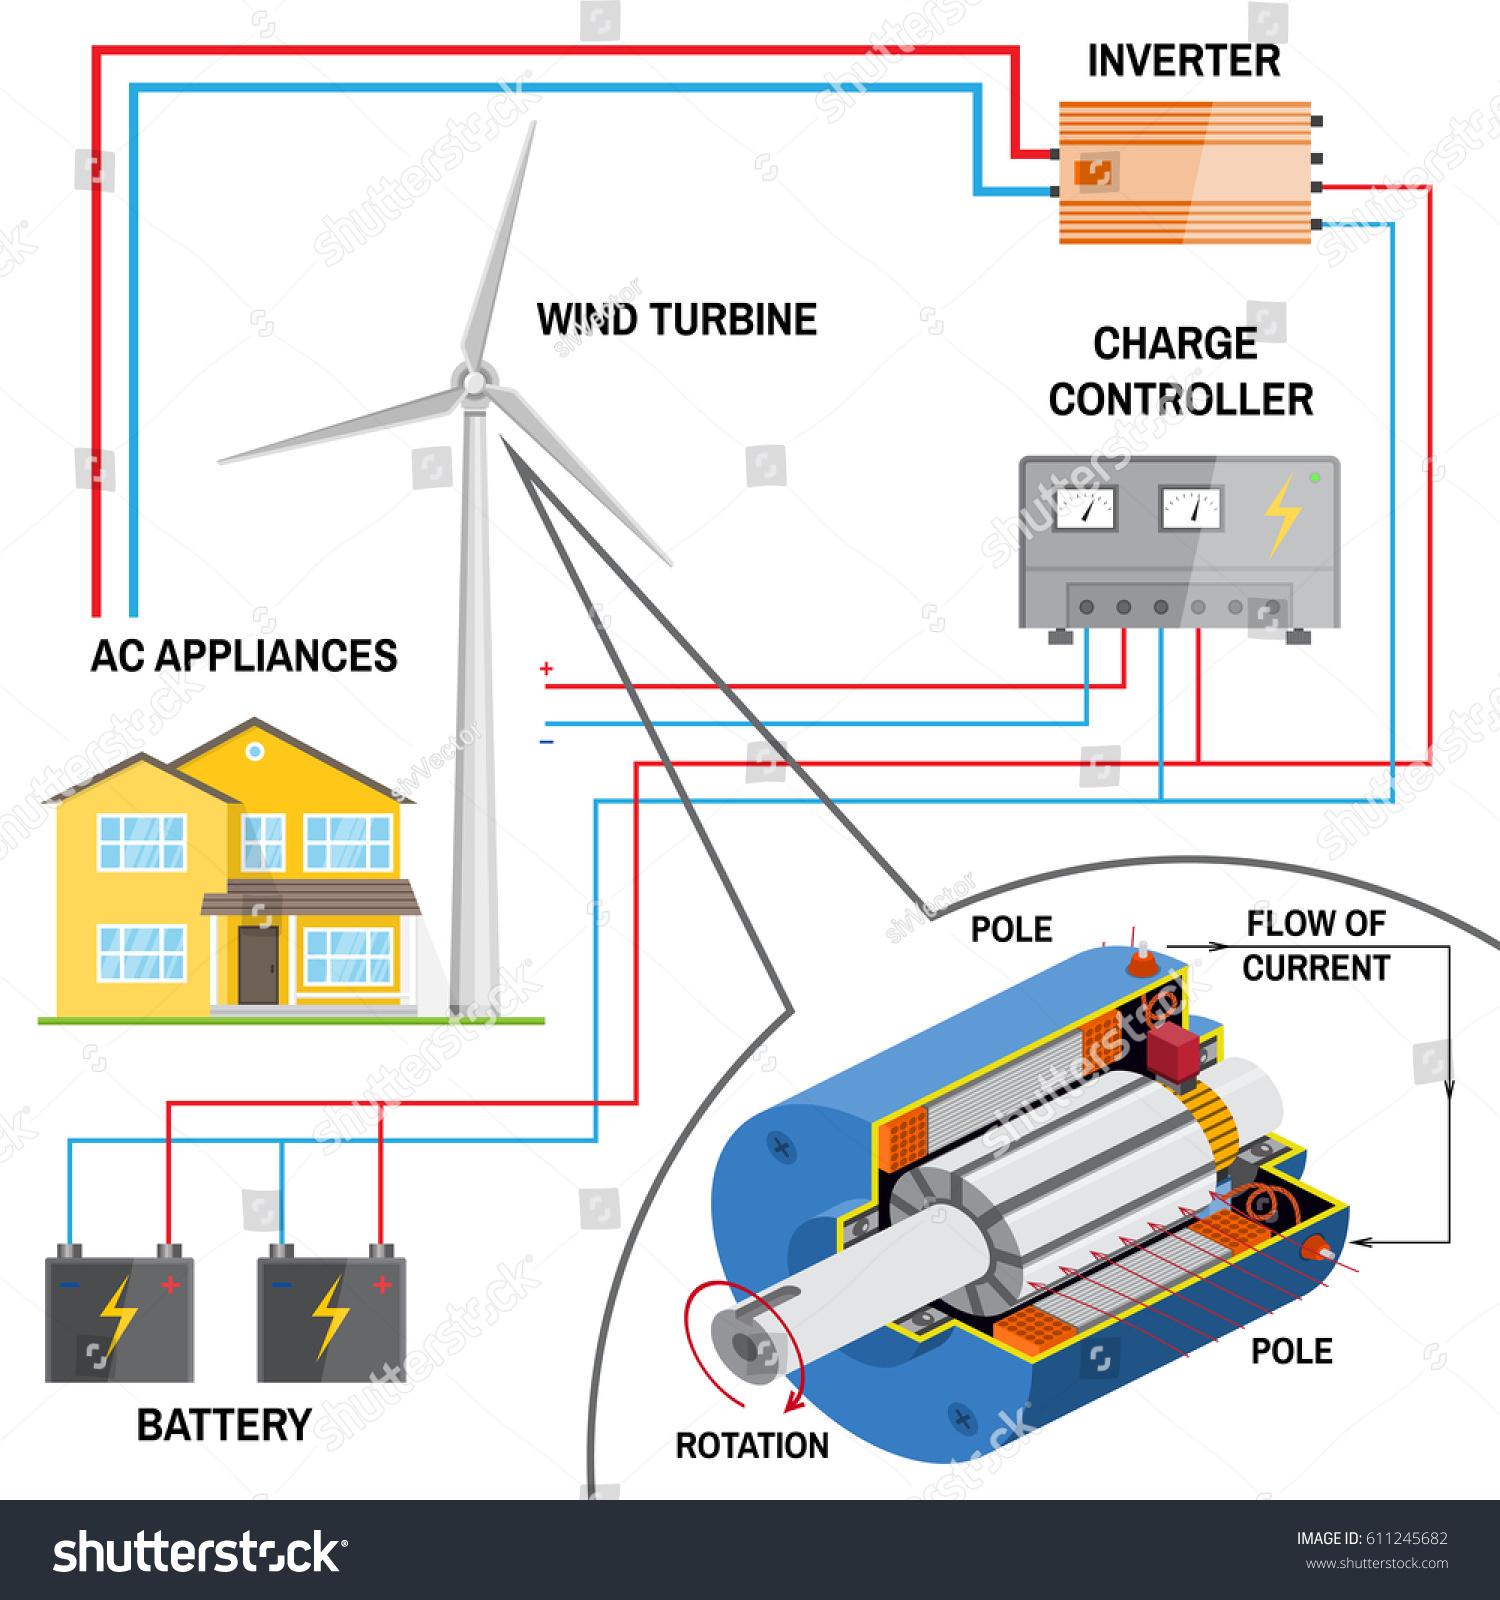 Pleasing Wind Turbine System Home Renewable Energy Stock Vector Royalty Free Wiring Cloud Venetioscosaoduqqnet